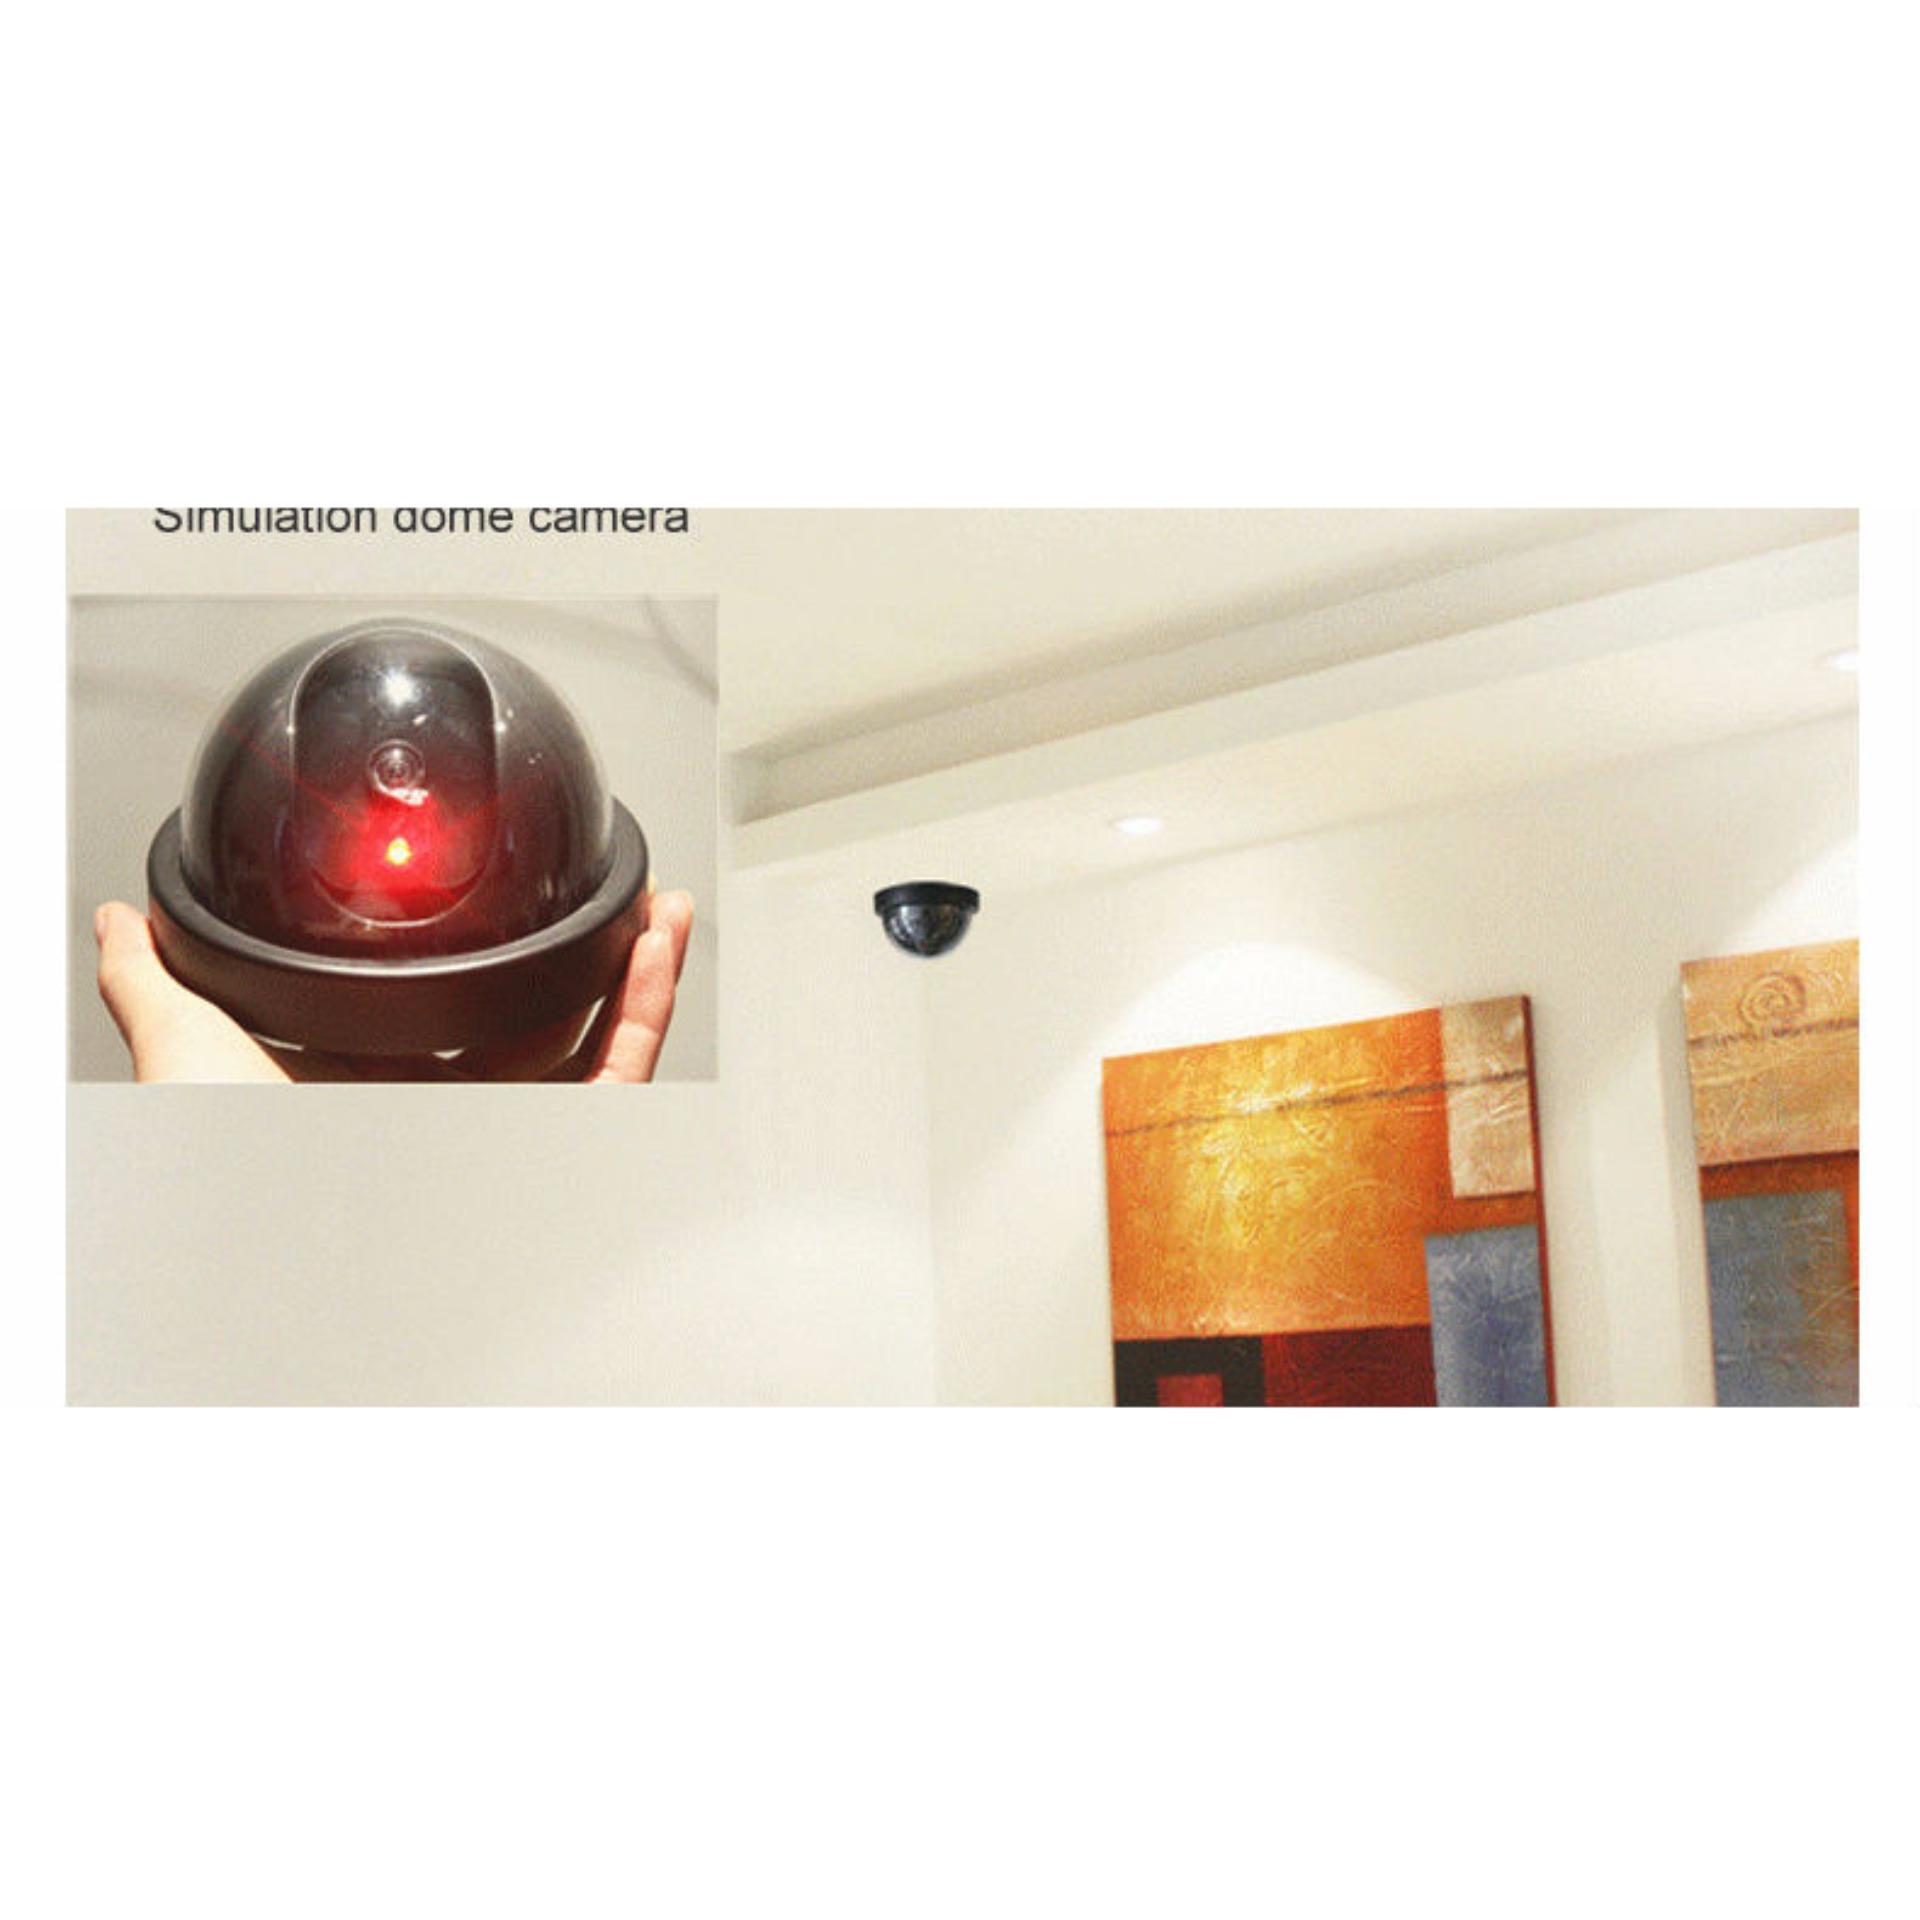 ... CCTV Dummy Lampu LED Kedip Fake Security Camera - CCTV Anti MalingCCTV Palsu CCTV Replika Mirip ...